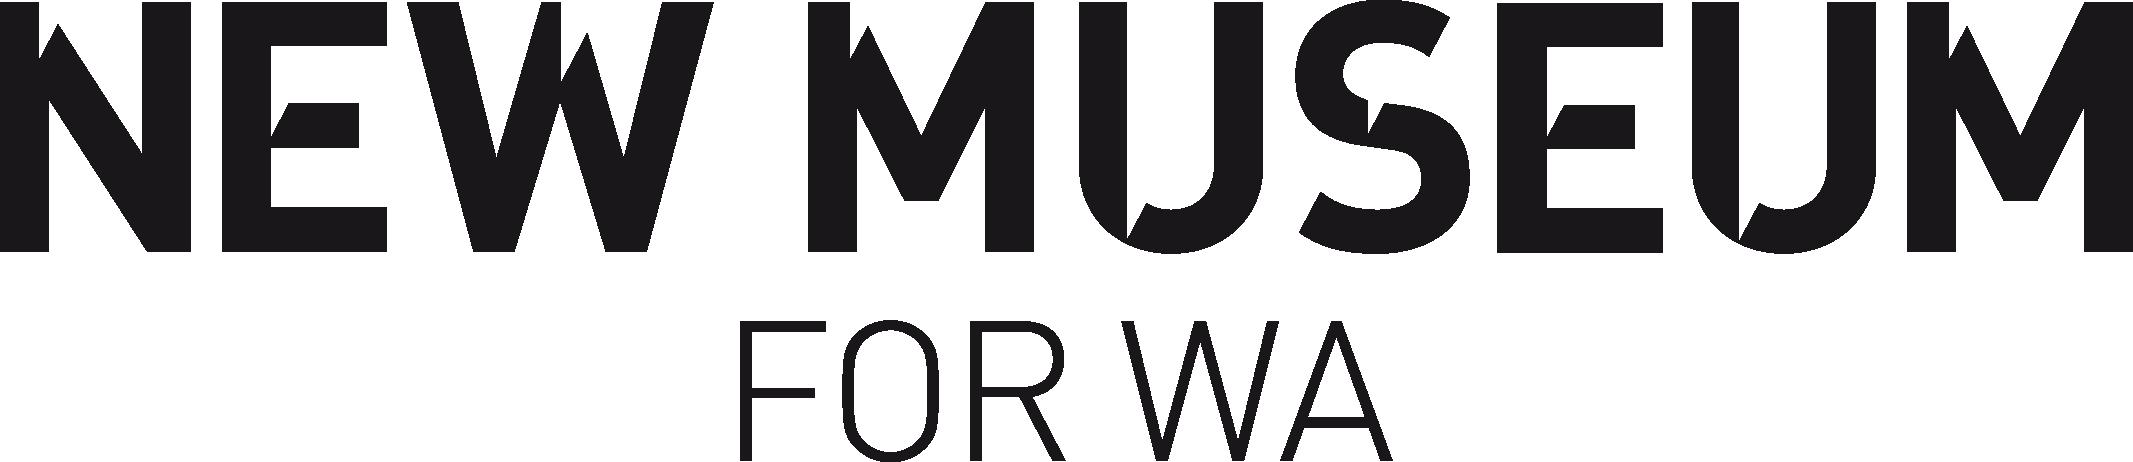 NewMuseumWA_Master_Black.png